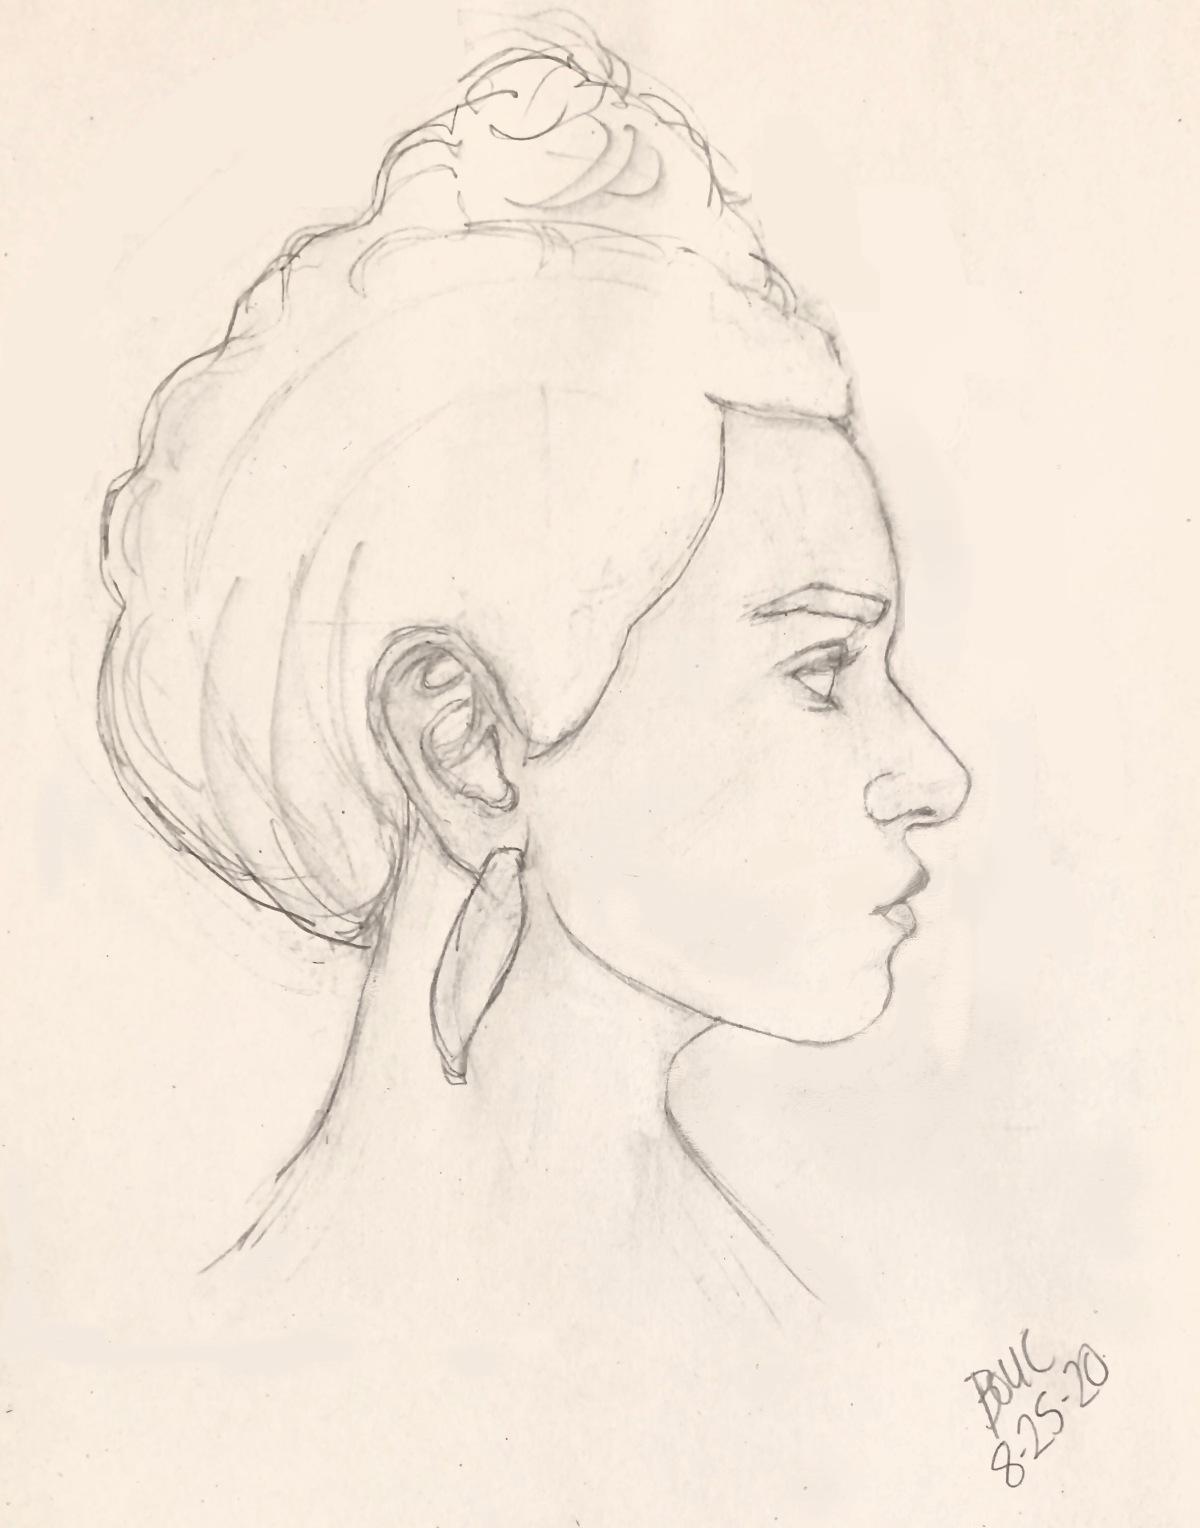 Portrait Sketch in Graphite of Raquel C from Sktchy